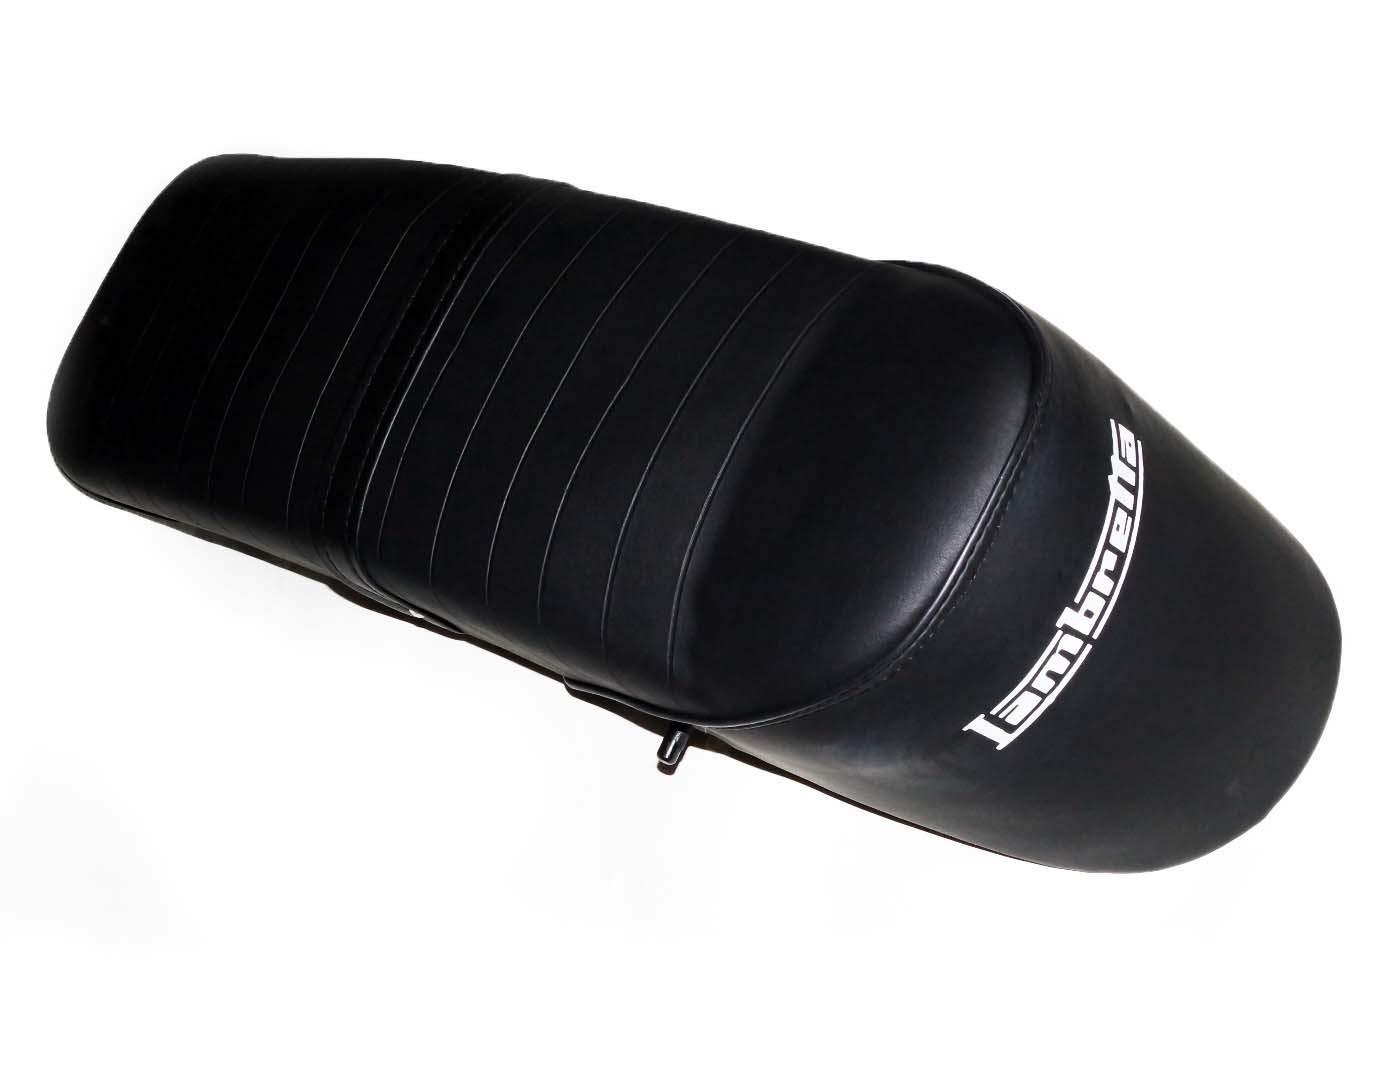 Enfieldcounty New Lambretta GP LI TV SX Slope Back Ancillotti Type Seat Black